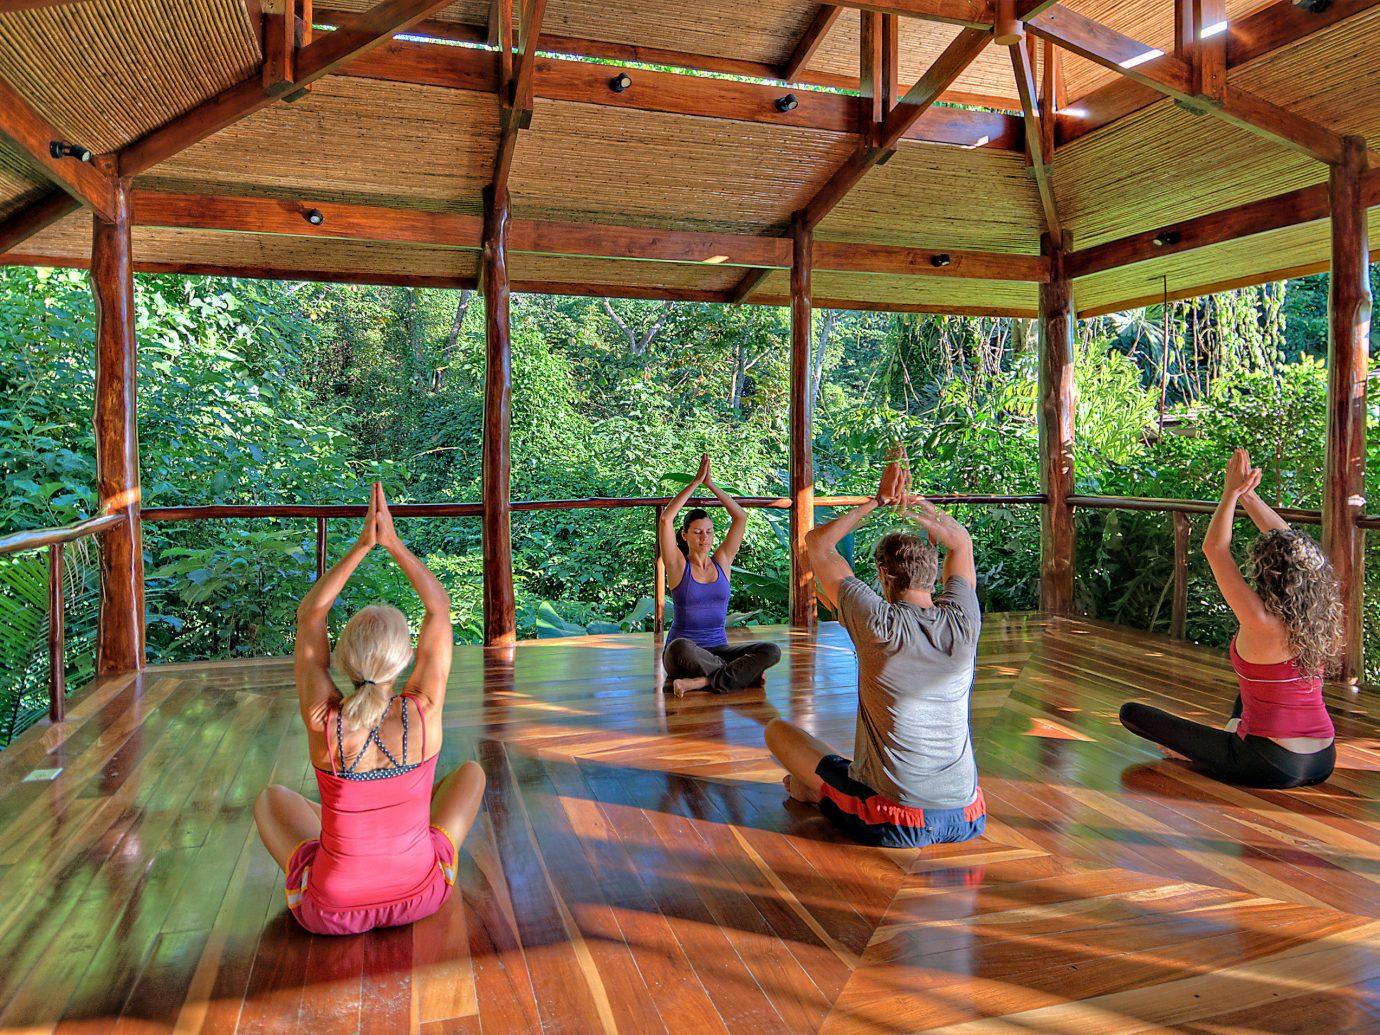 Health + Wellness Hotels Spa Retreats leisure floor building outdoor play equipment Resort Playground Play backyard Family